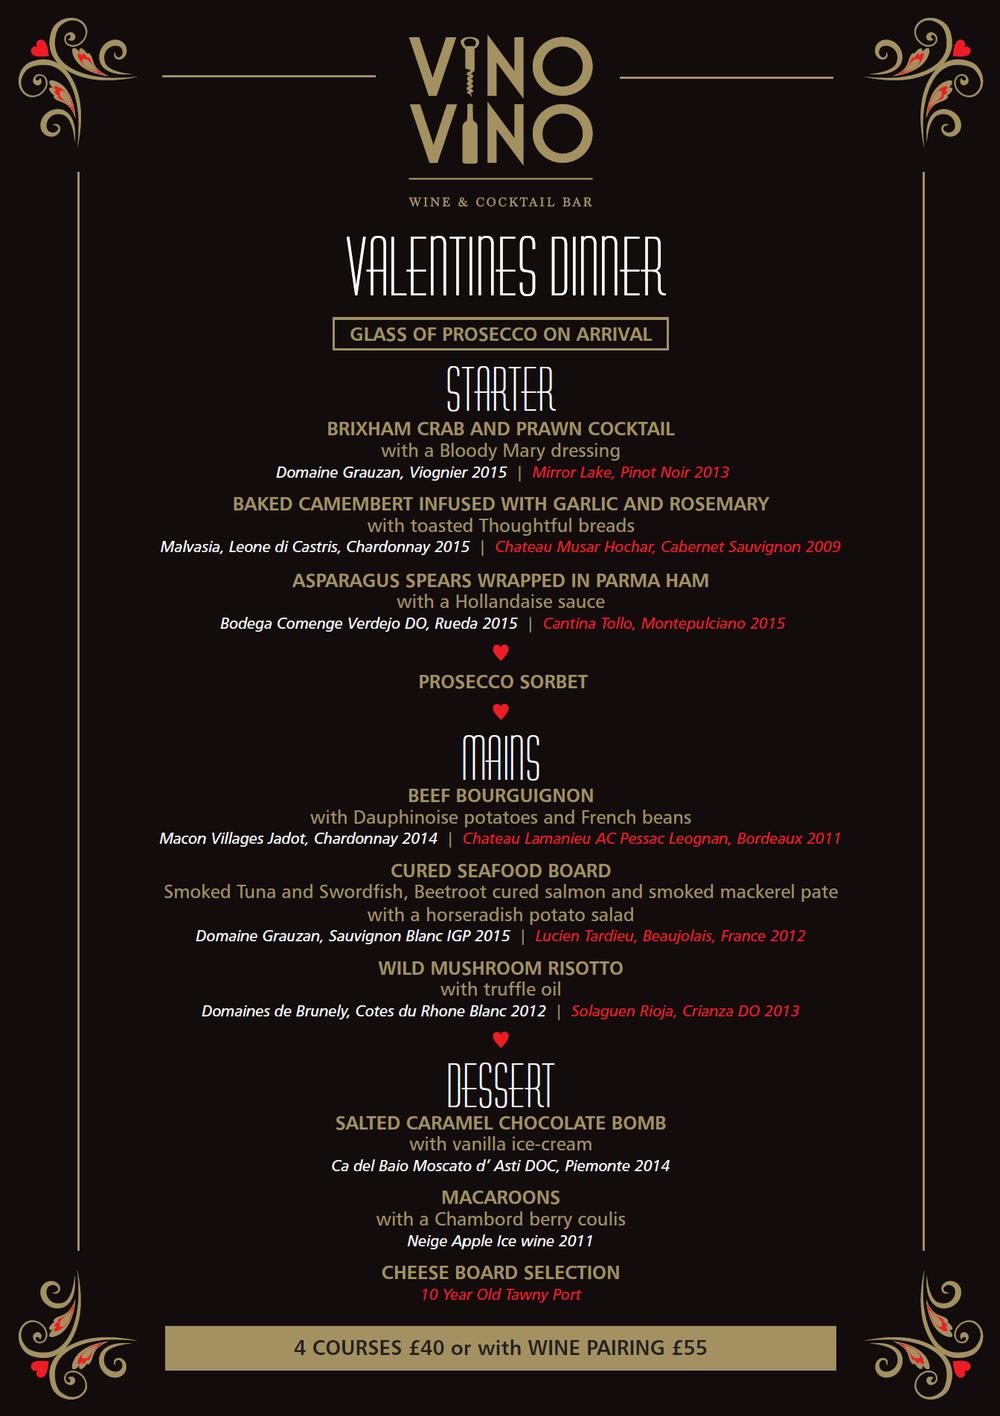 Vino Vino Valentines Dinner Menu